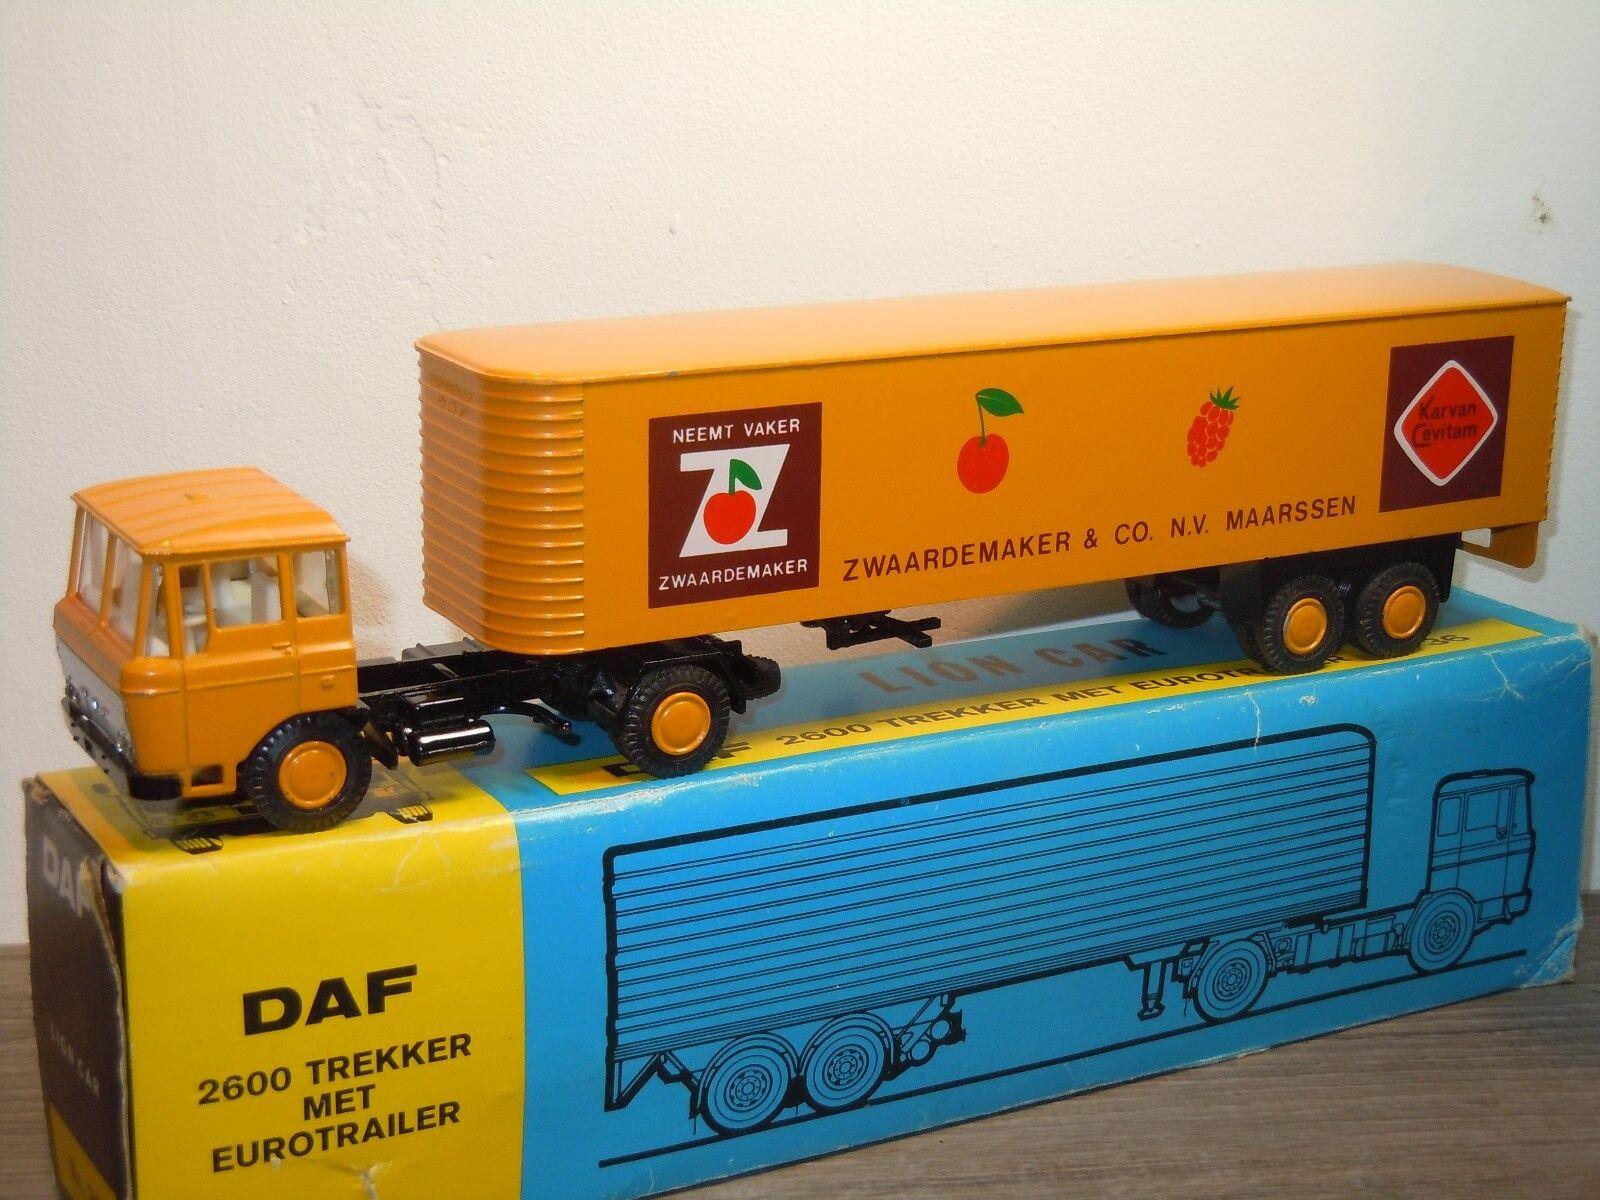 Daf 2600 met Eurossorailer Zwaardemaker - Lion Car 36 Holland 1 50 in Box 36388